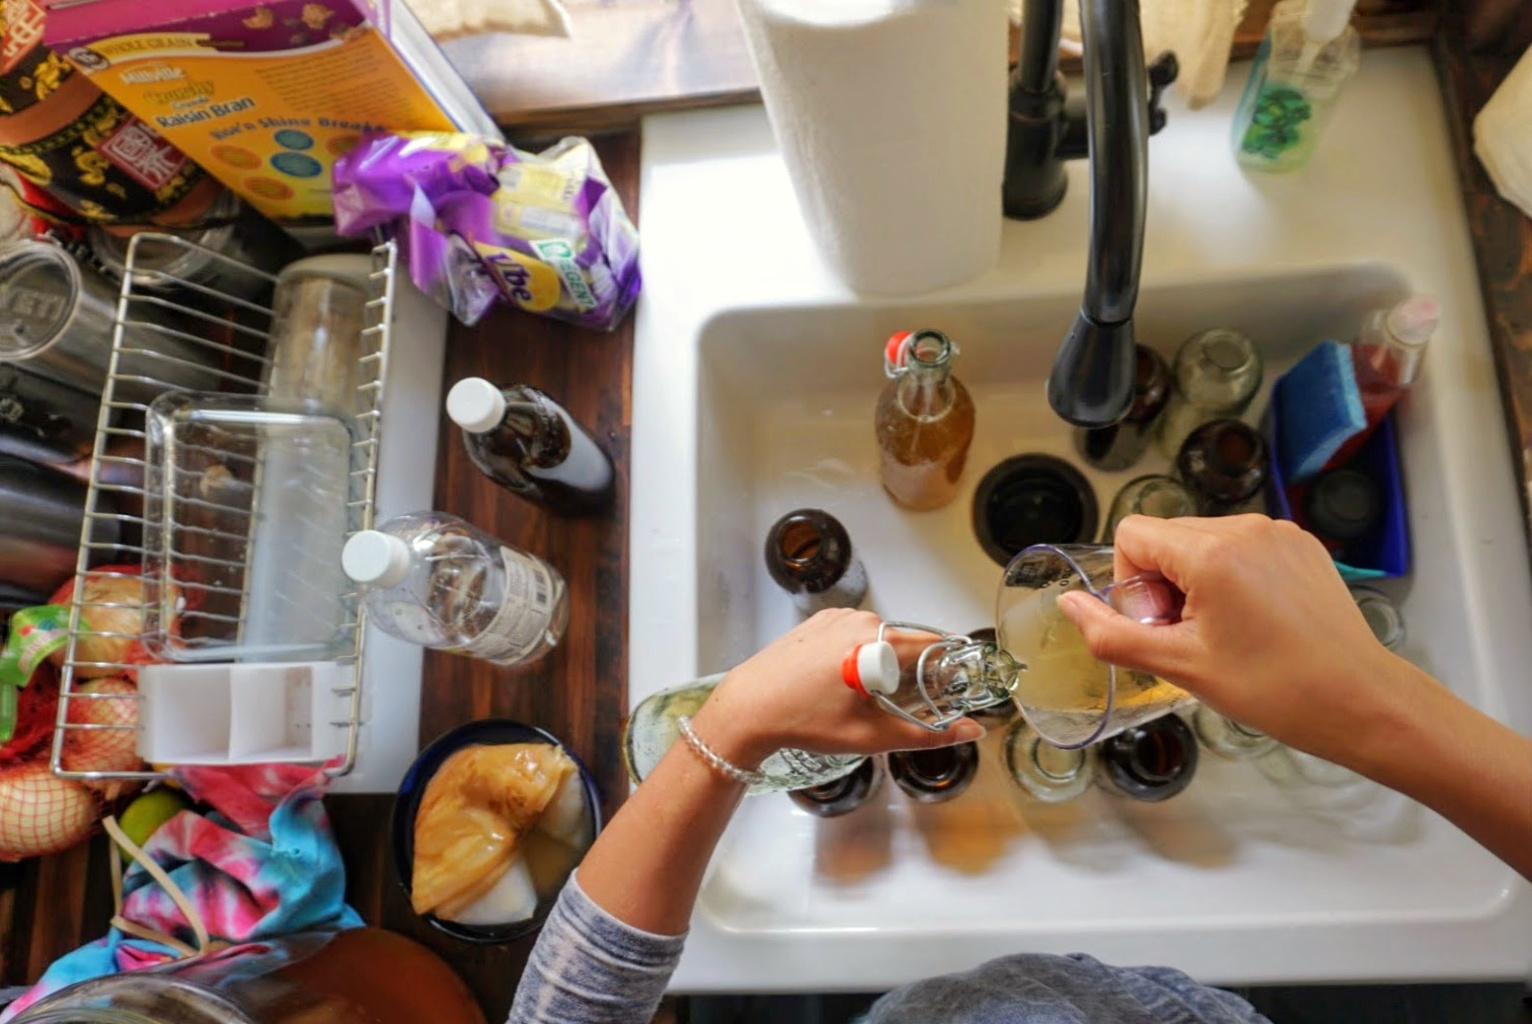 Tiny Home living Kombucha Brewing Scoby bottling homemade organic flavors fruit original